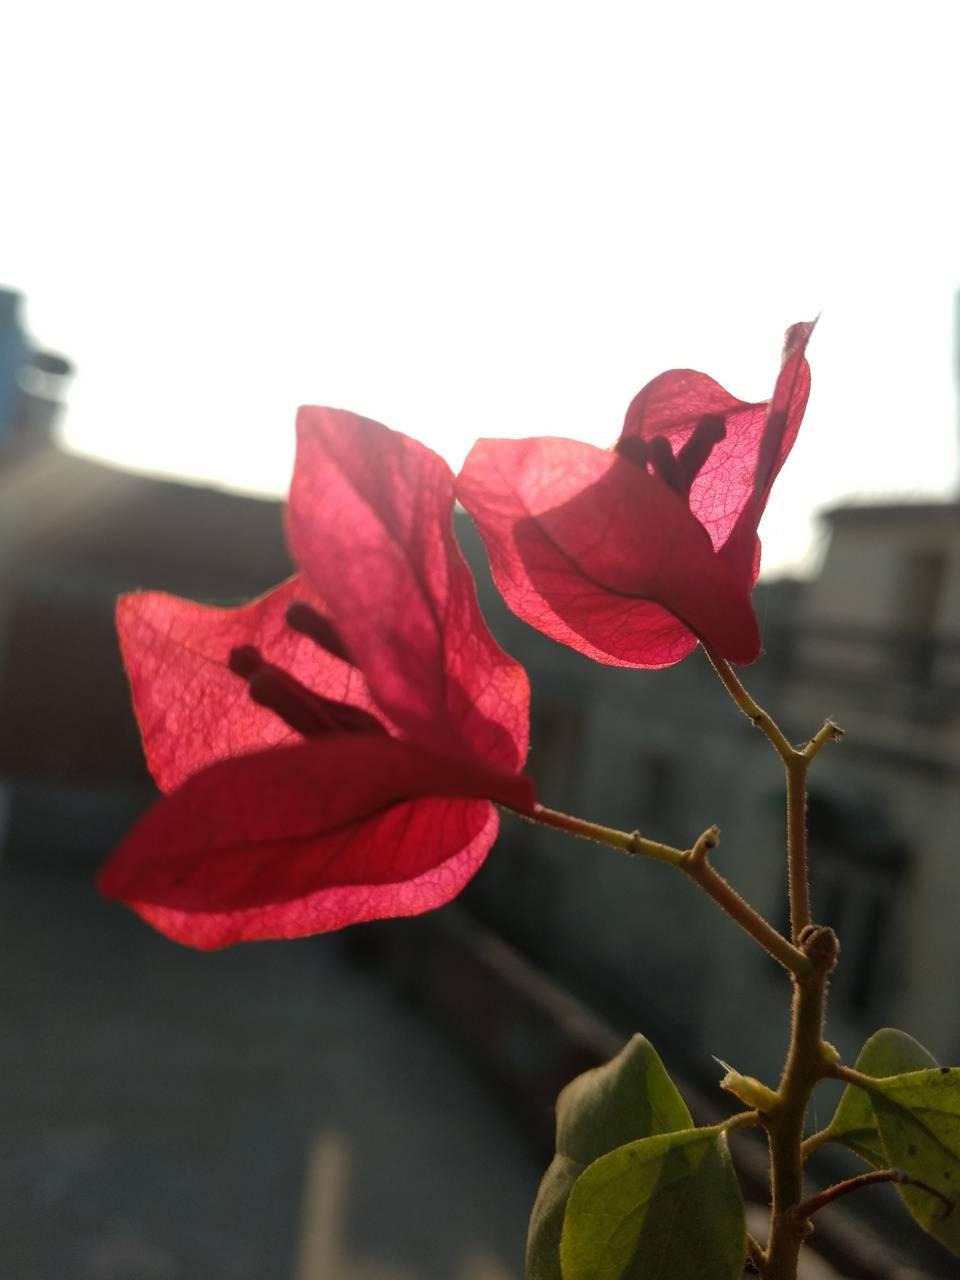 Flower down